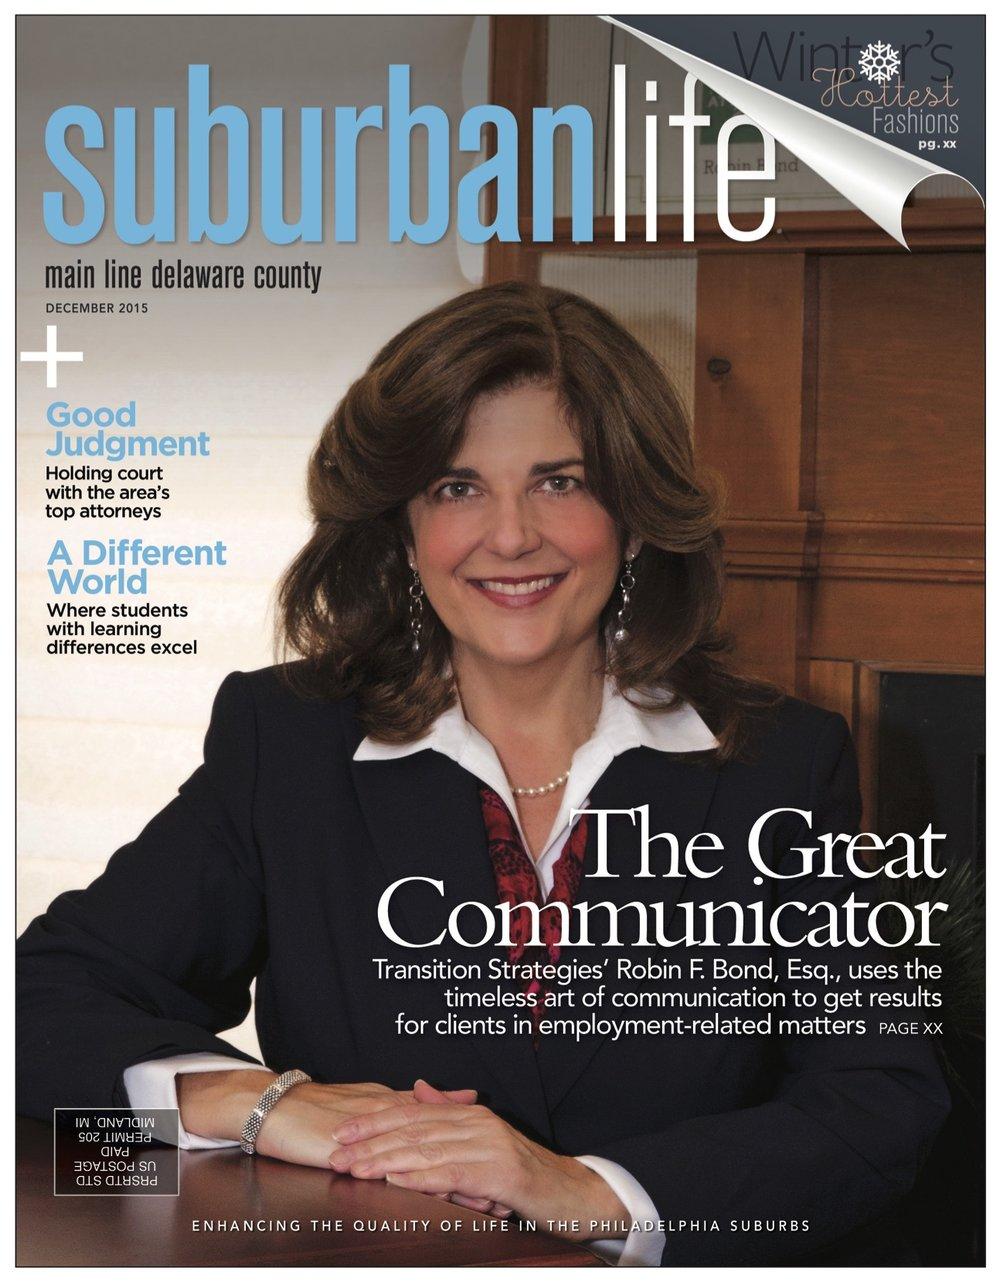 Robin's Suburban Life Cover 2015